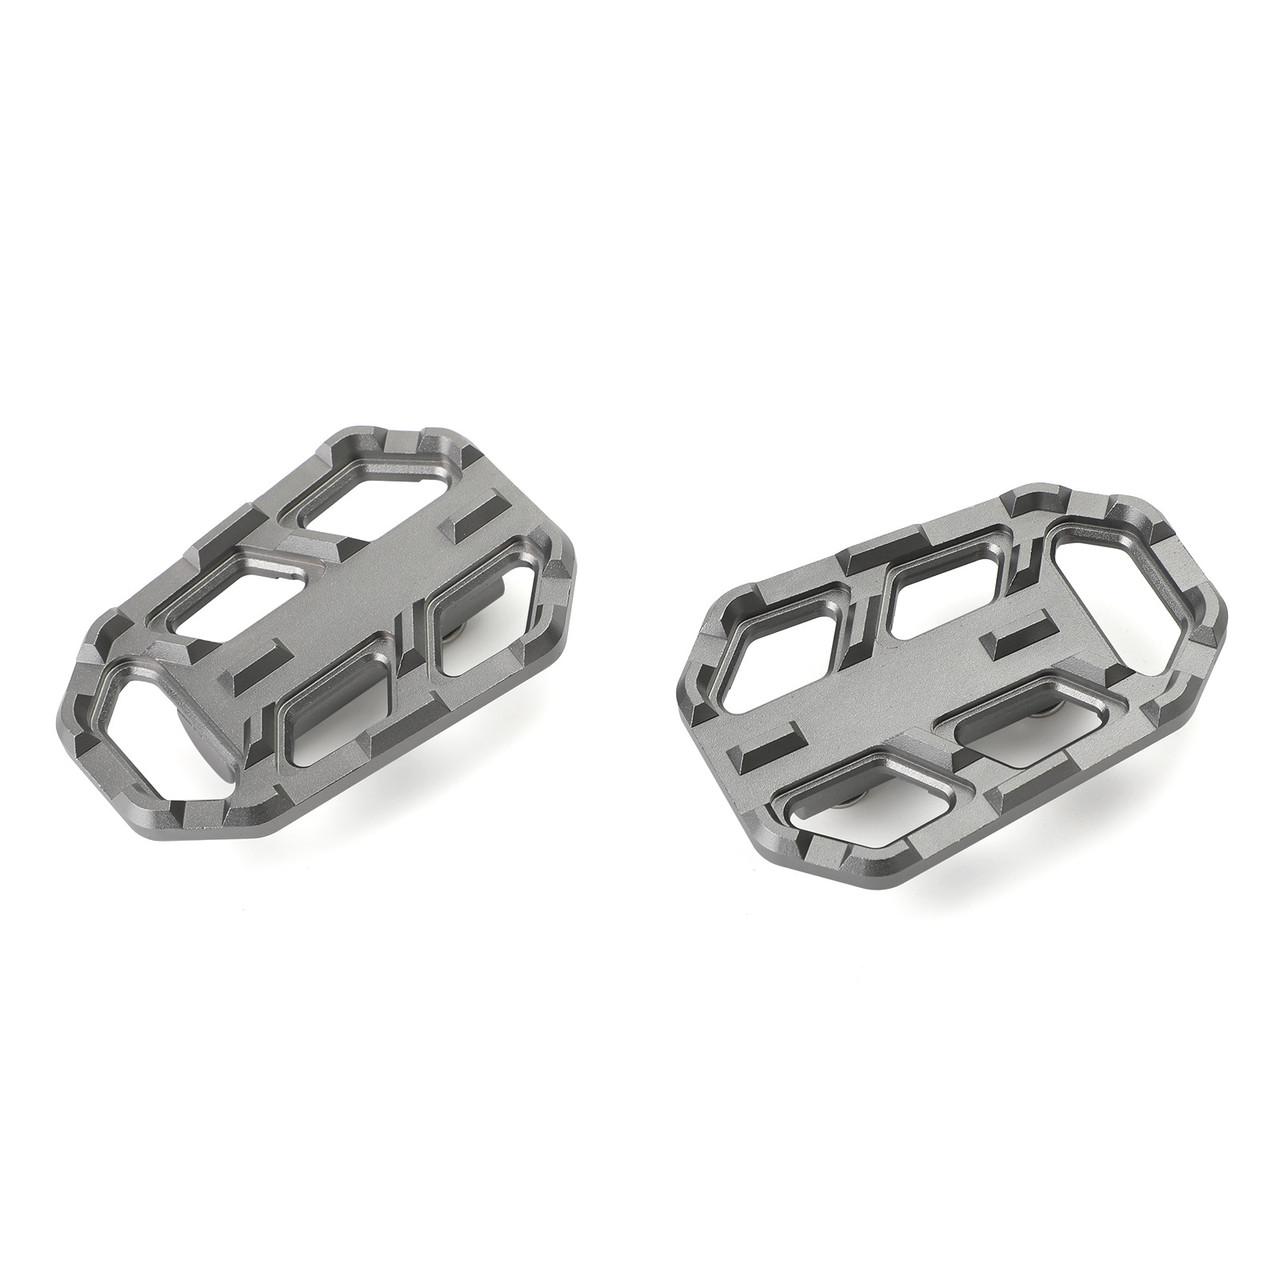 Foot Pedals Footpegs For BMW G310GS 17-19 S1000XR 15-19 BMW R1200GS (Adv.)13-19 Titanium